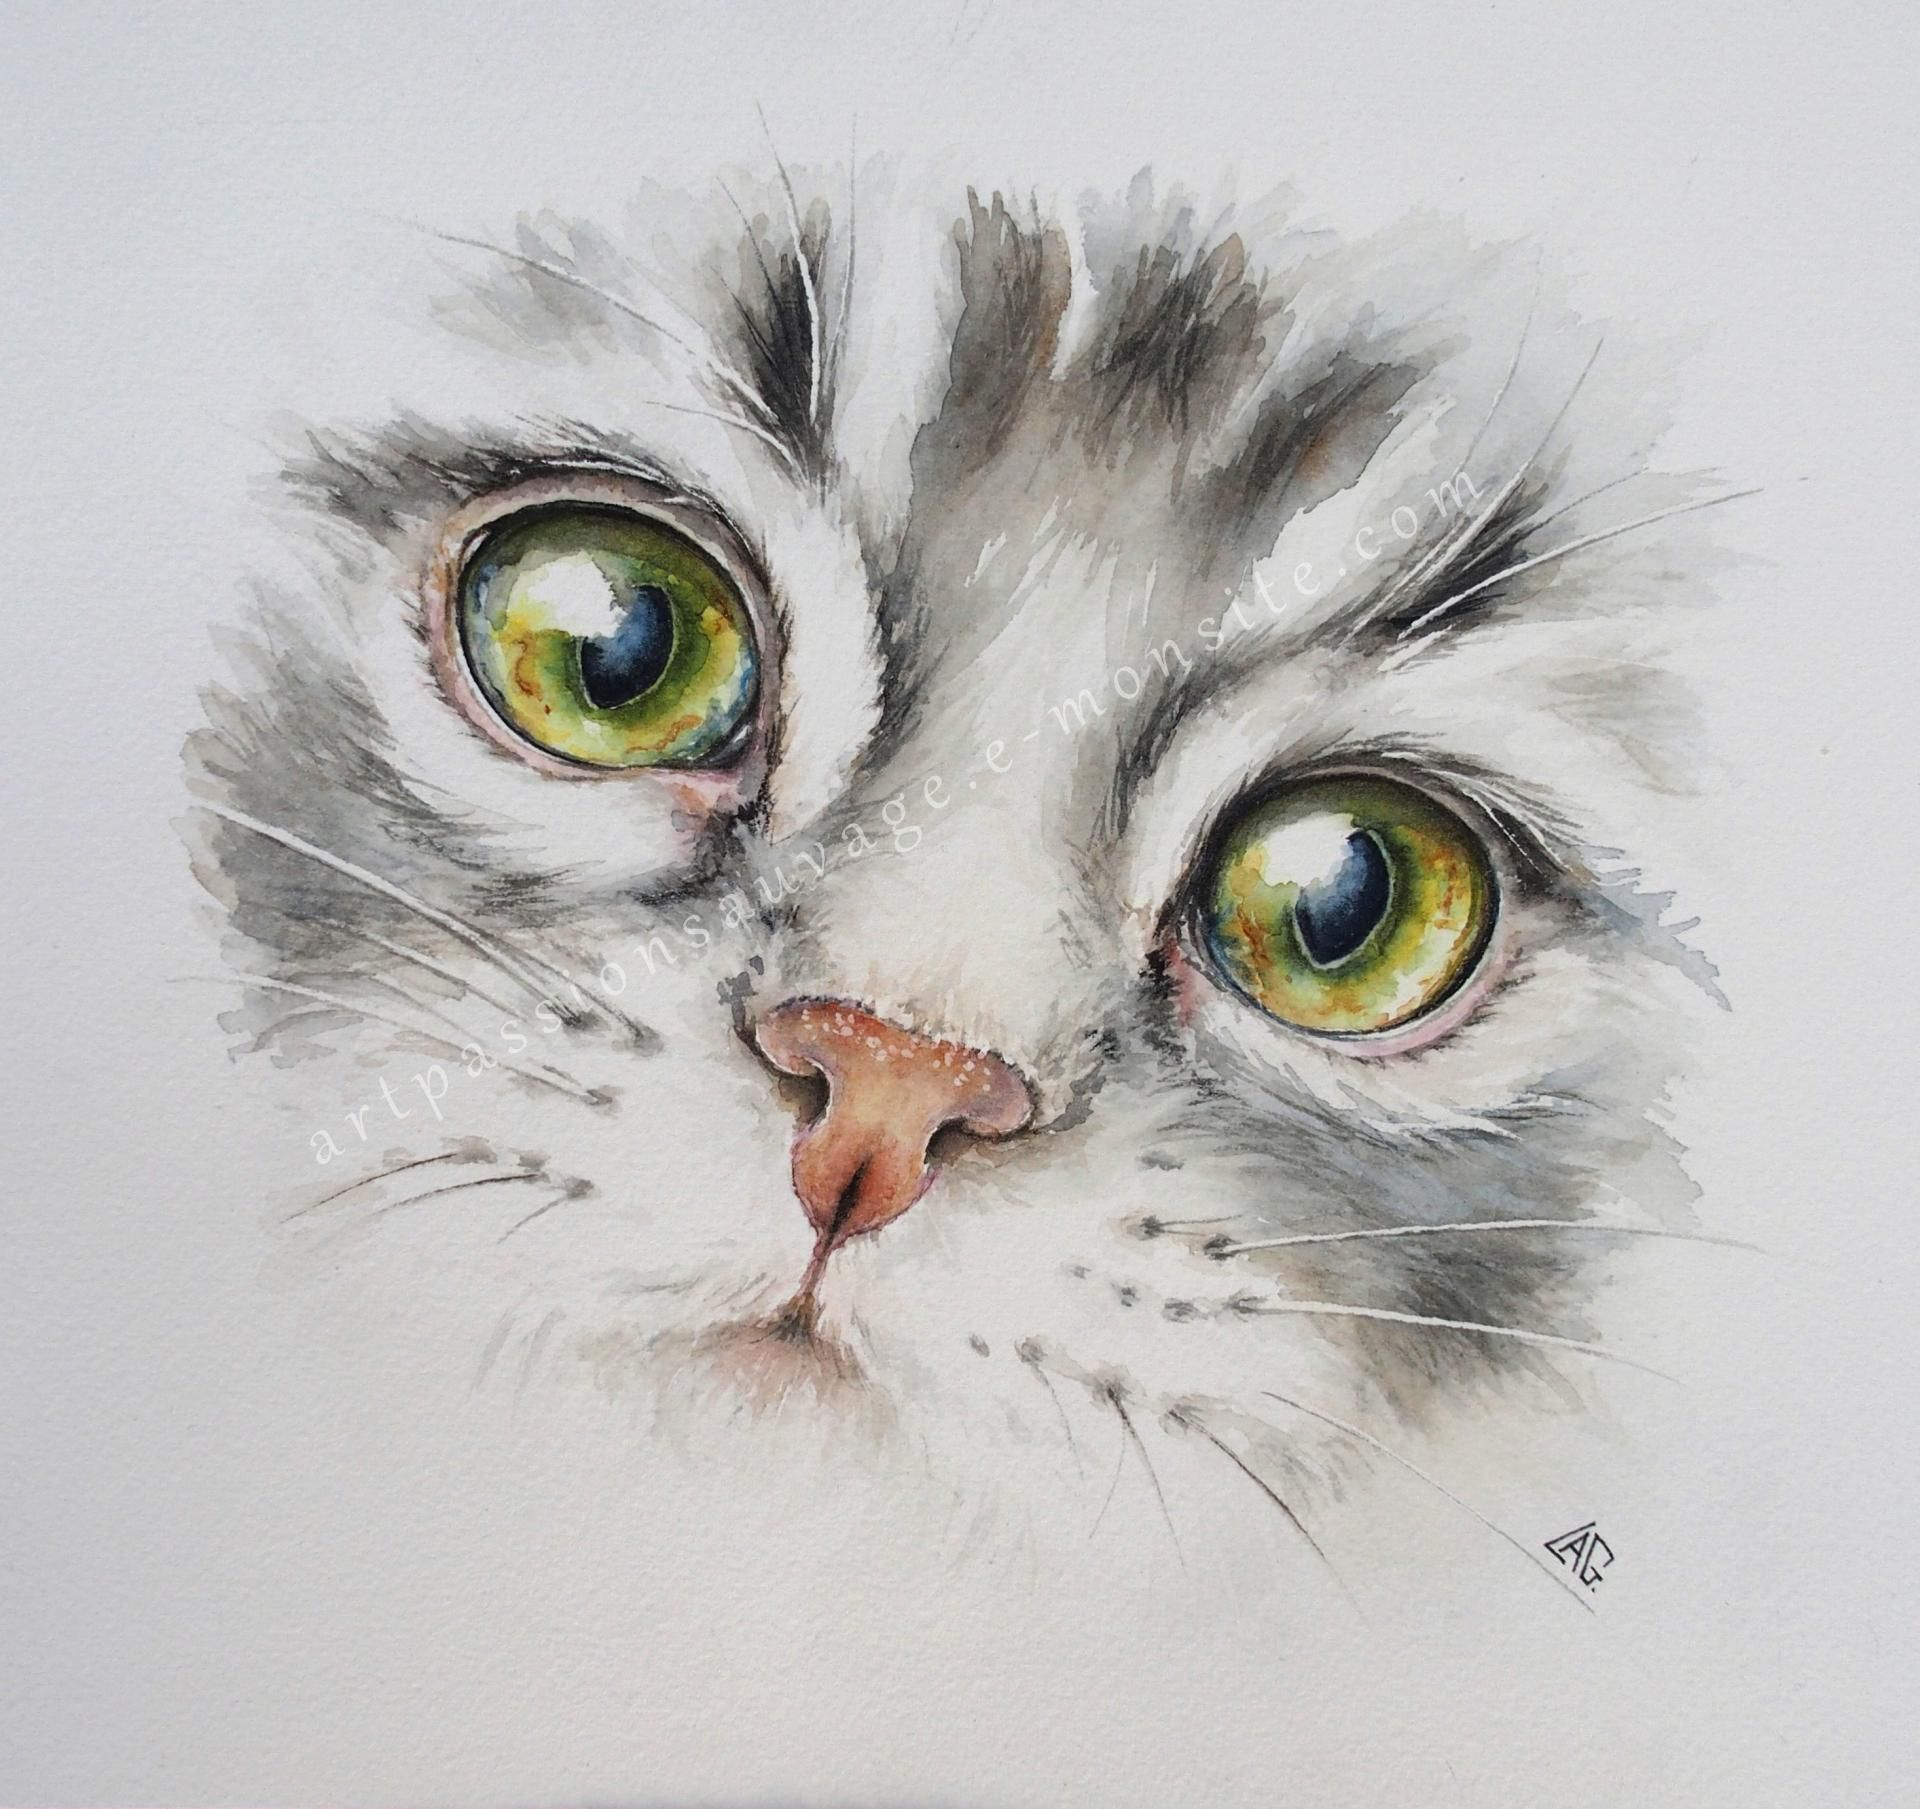 Aquarelles Animaux Aquarelle Chat Pinterest Watercolor Cat